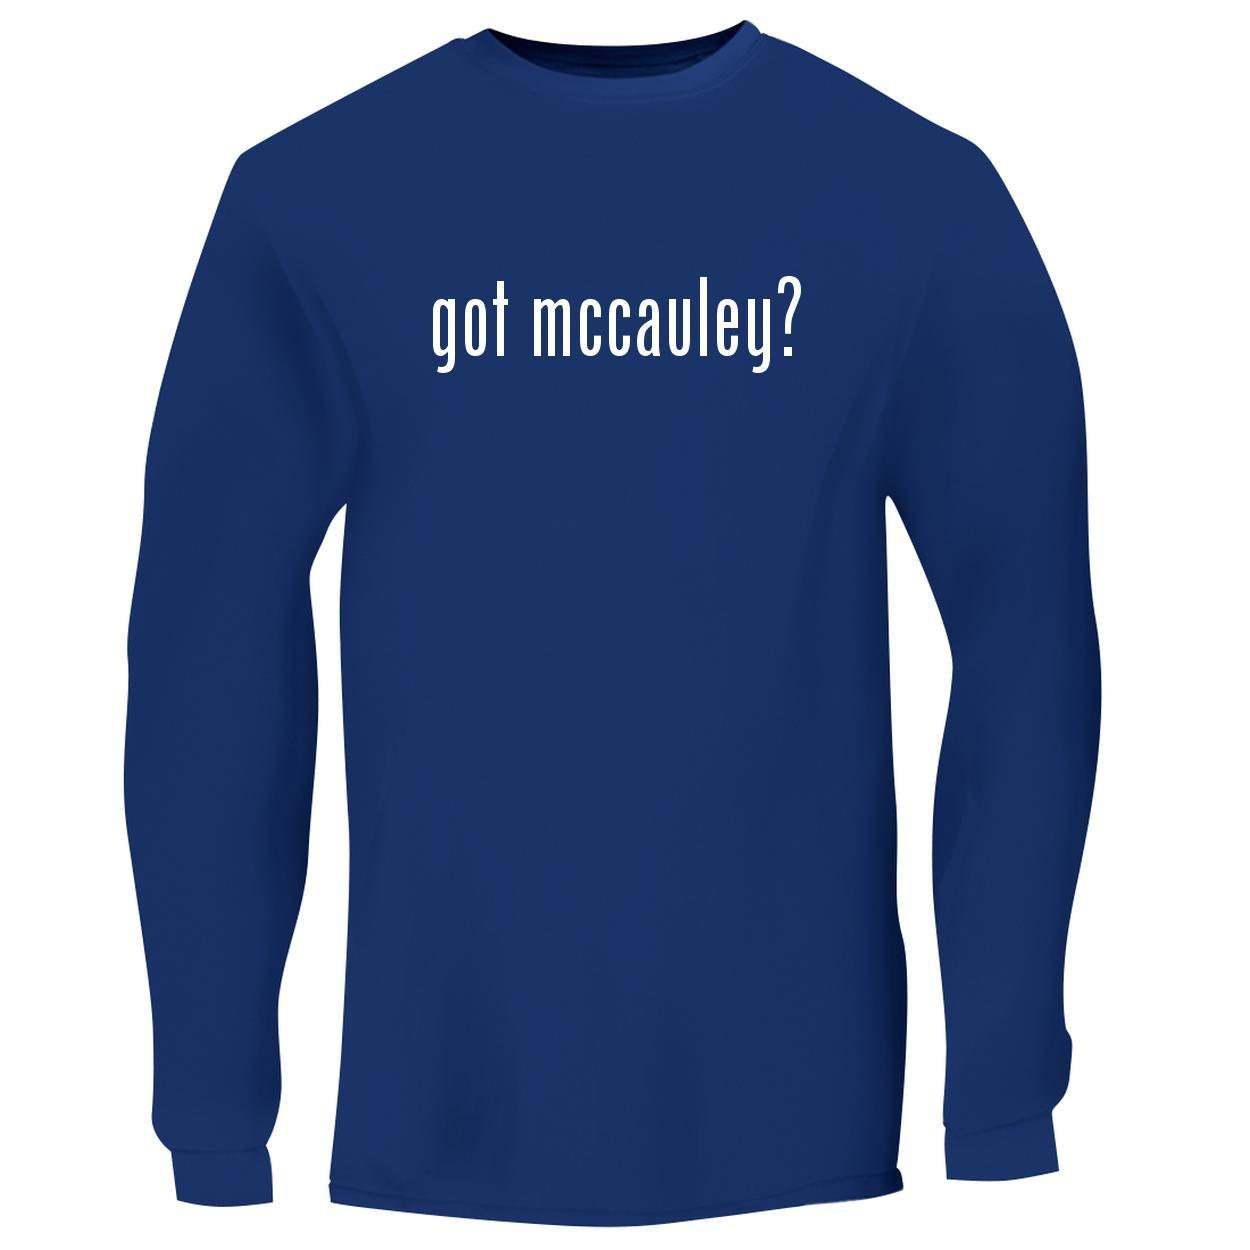 Got Mccauley Graphic Tee 6966 Shirts